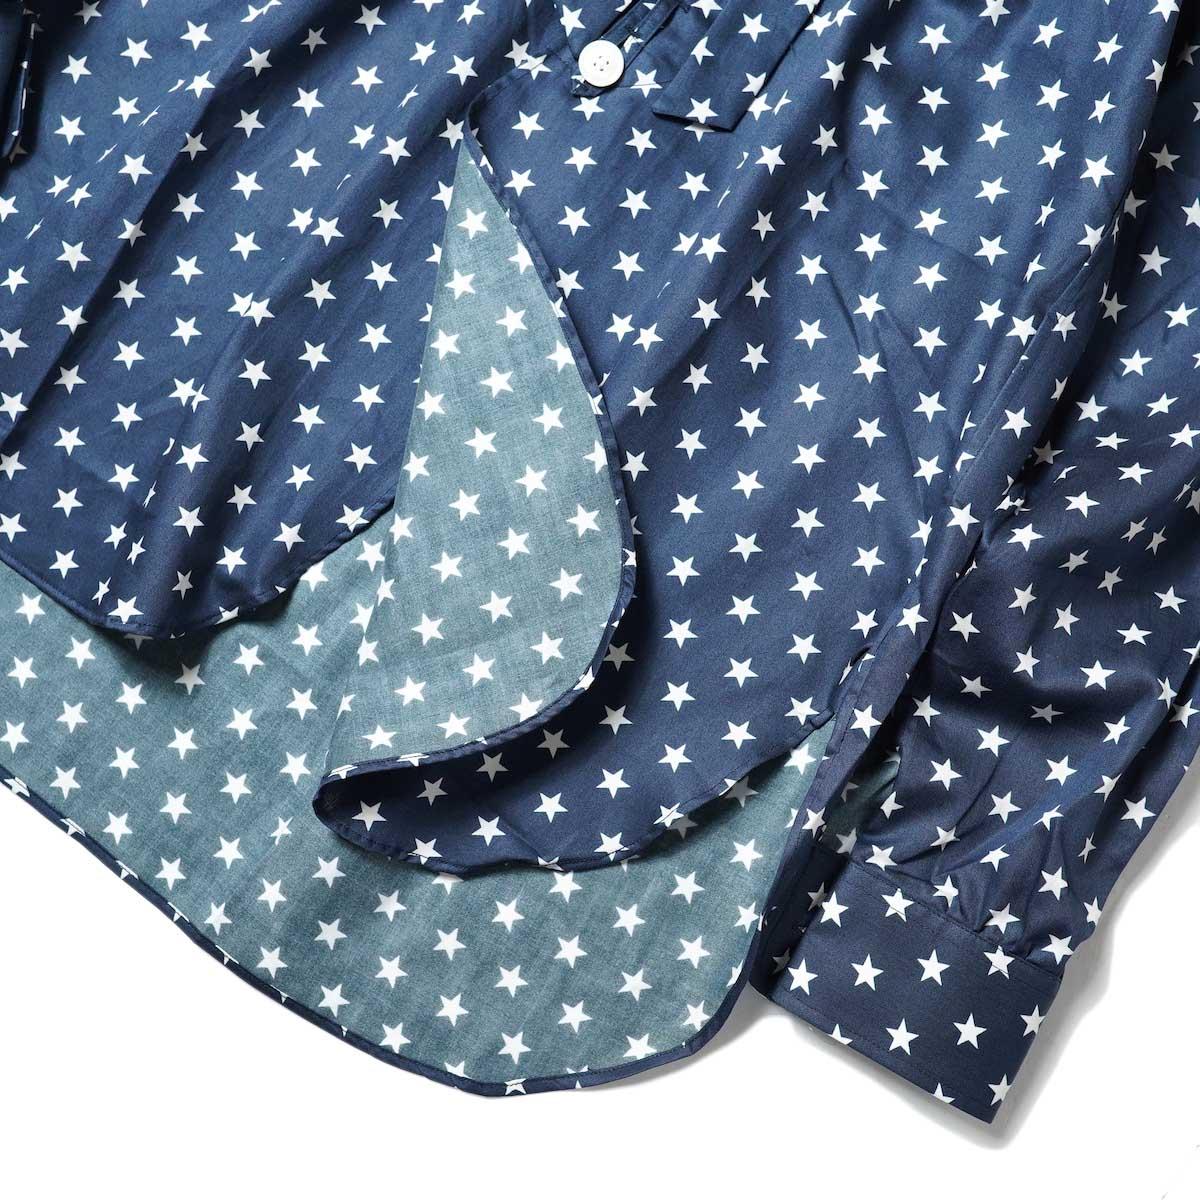 Needles / Ascot Collar EDW Shirt - Cotton Sateen / Pt (Star B) フロント・裾